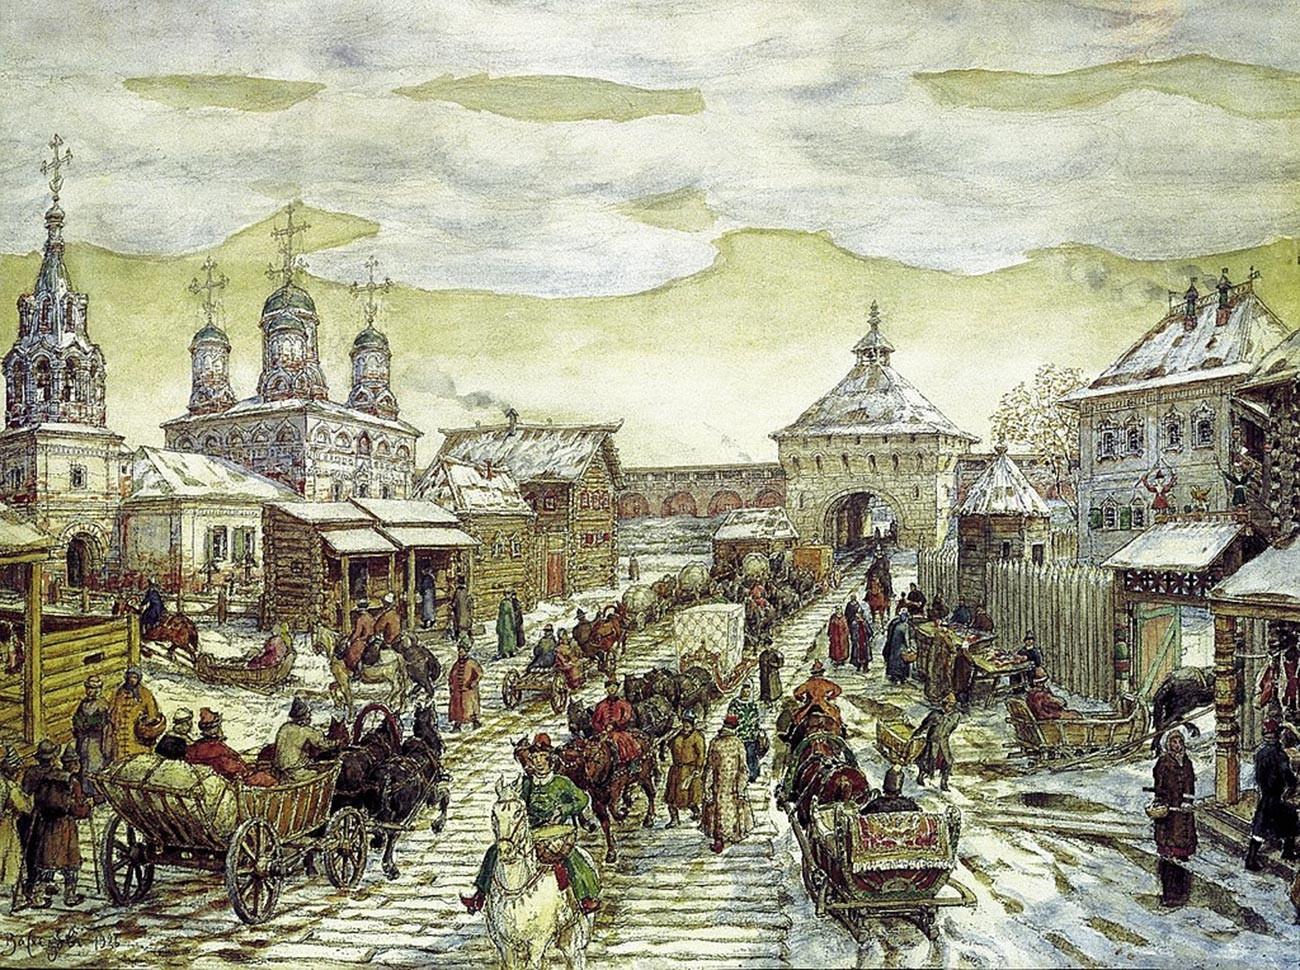 Apollinarij Vasnecov